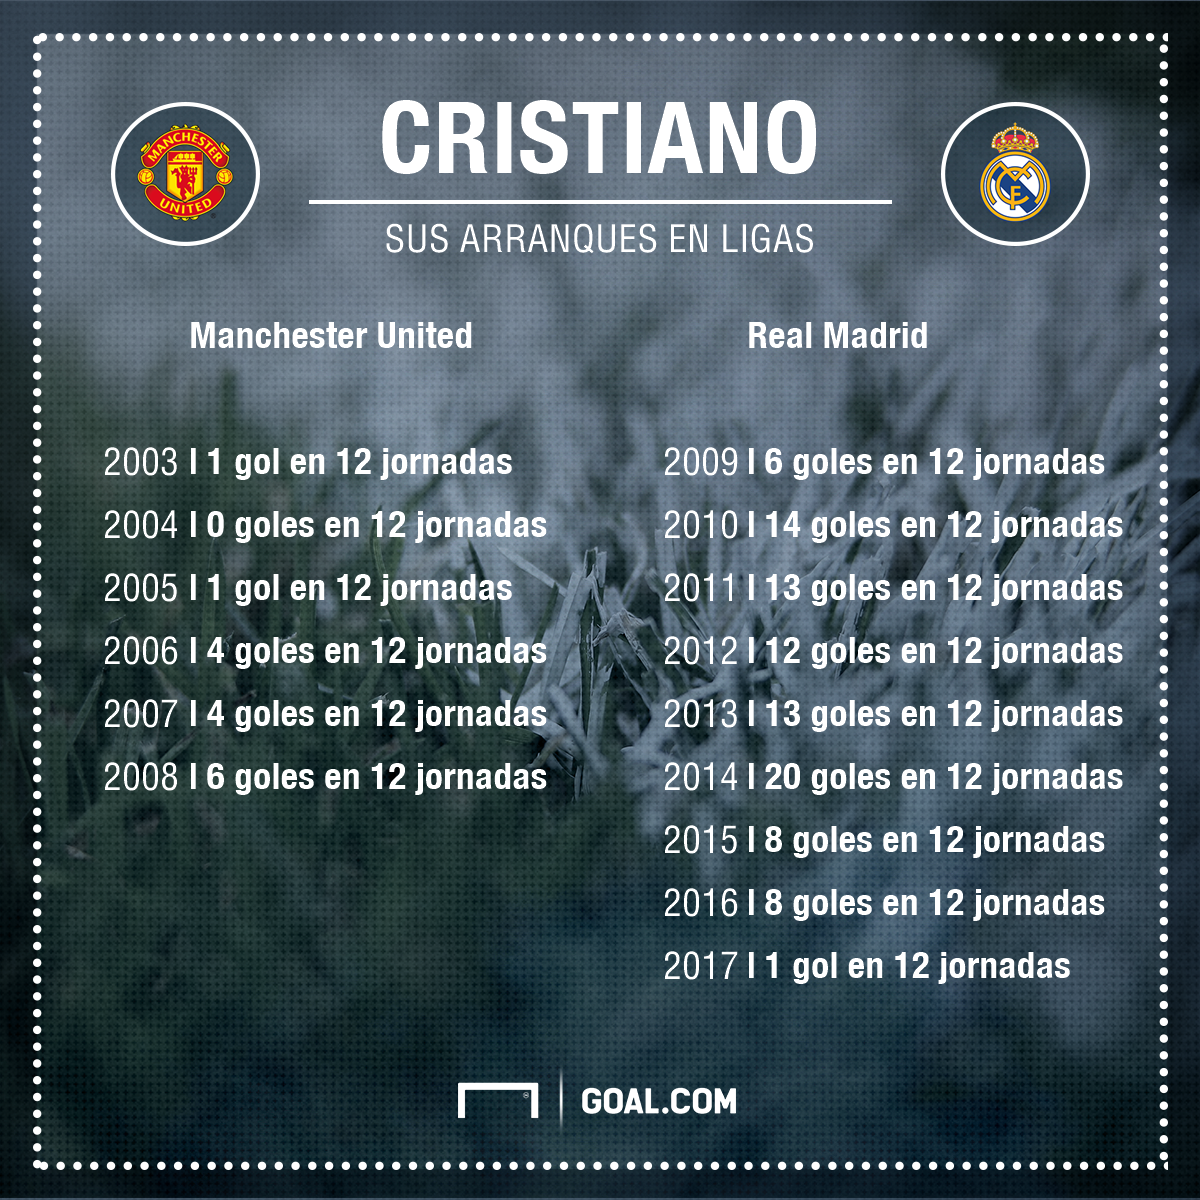 Goles Cristiano Ronaldo en 12 jornadas